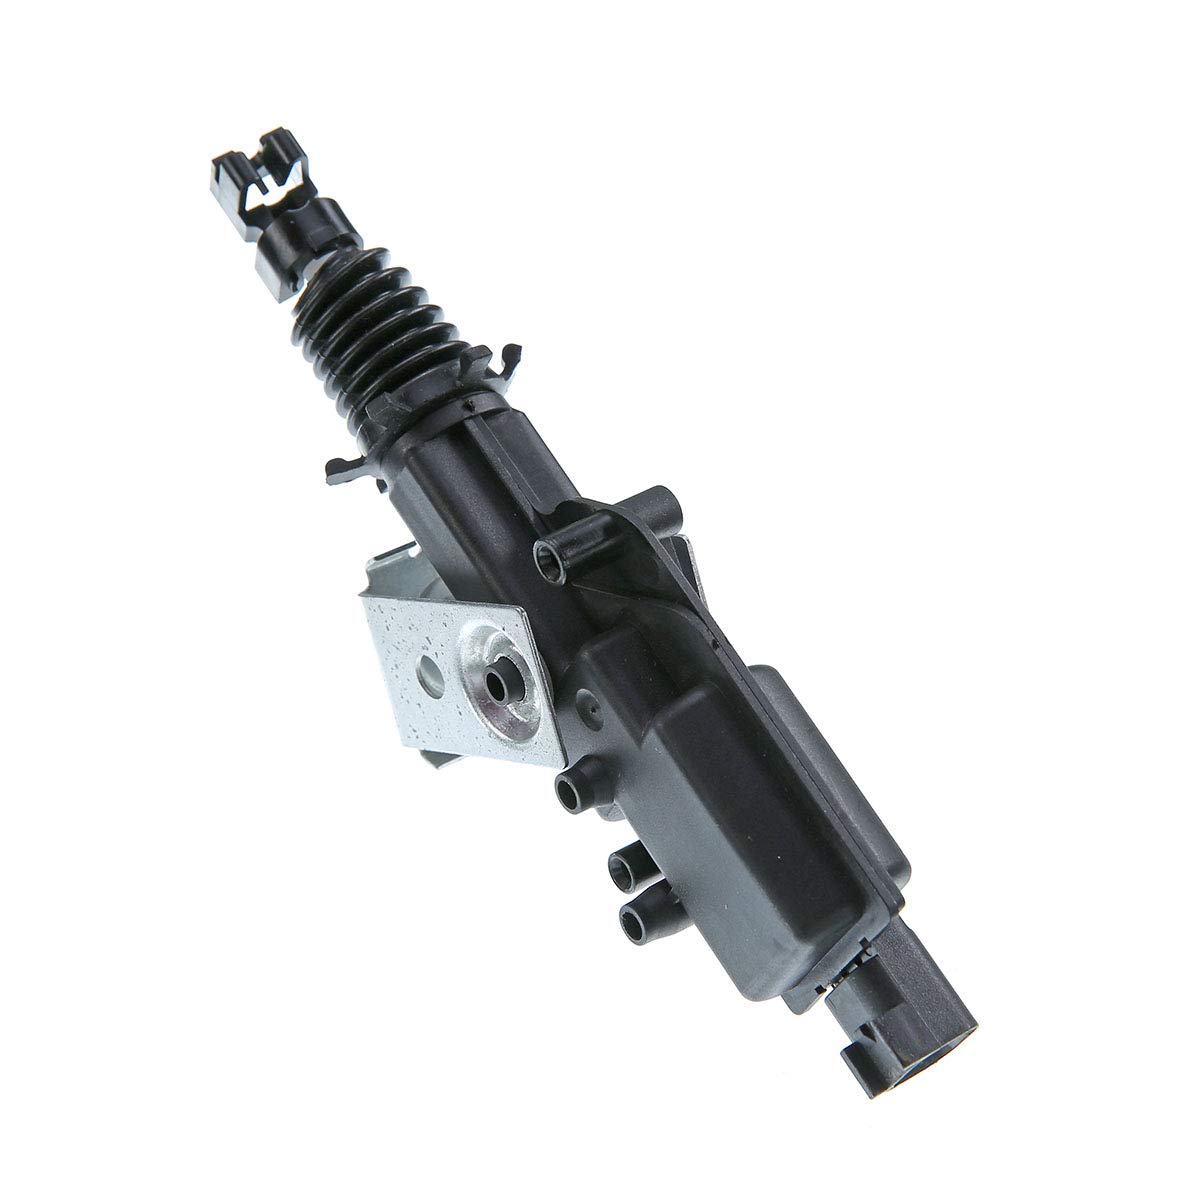 A-Premium Door Lock Actuator Motor for Lincoln Town Car 2005-2011 Ford Crown Victoria Mercury Grand Marquis 2008-2011